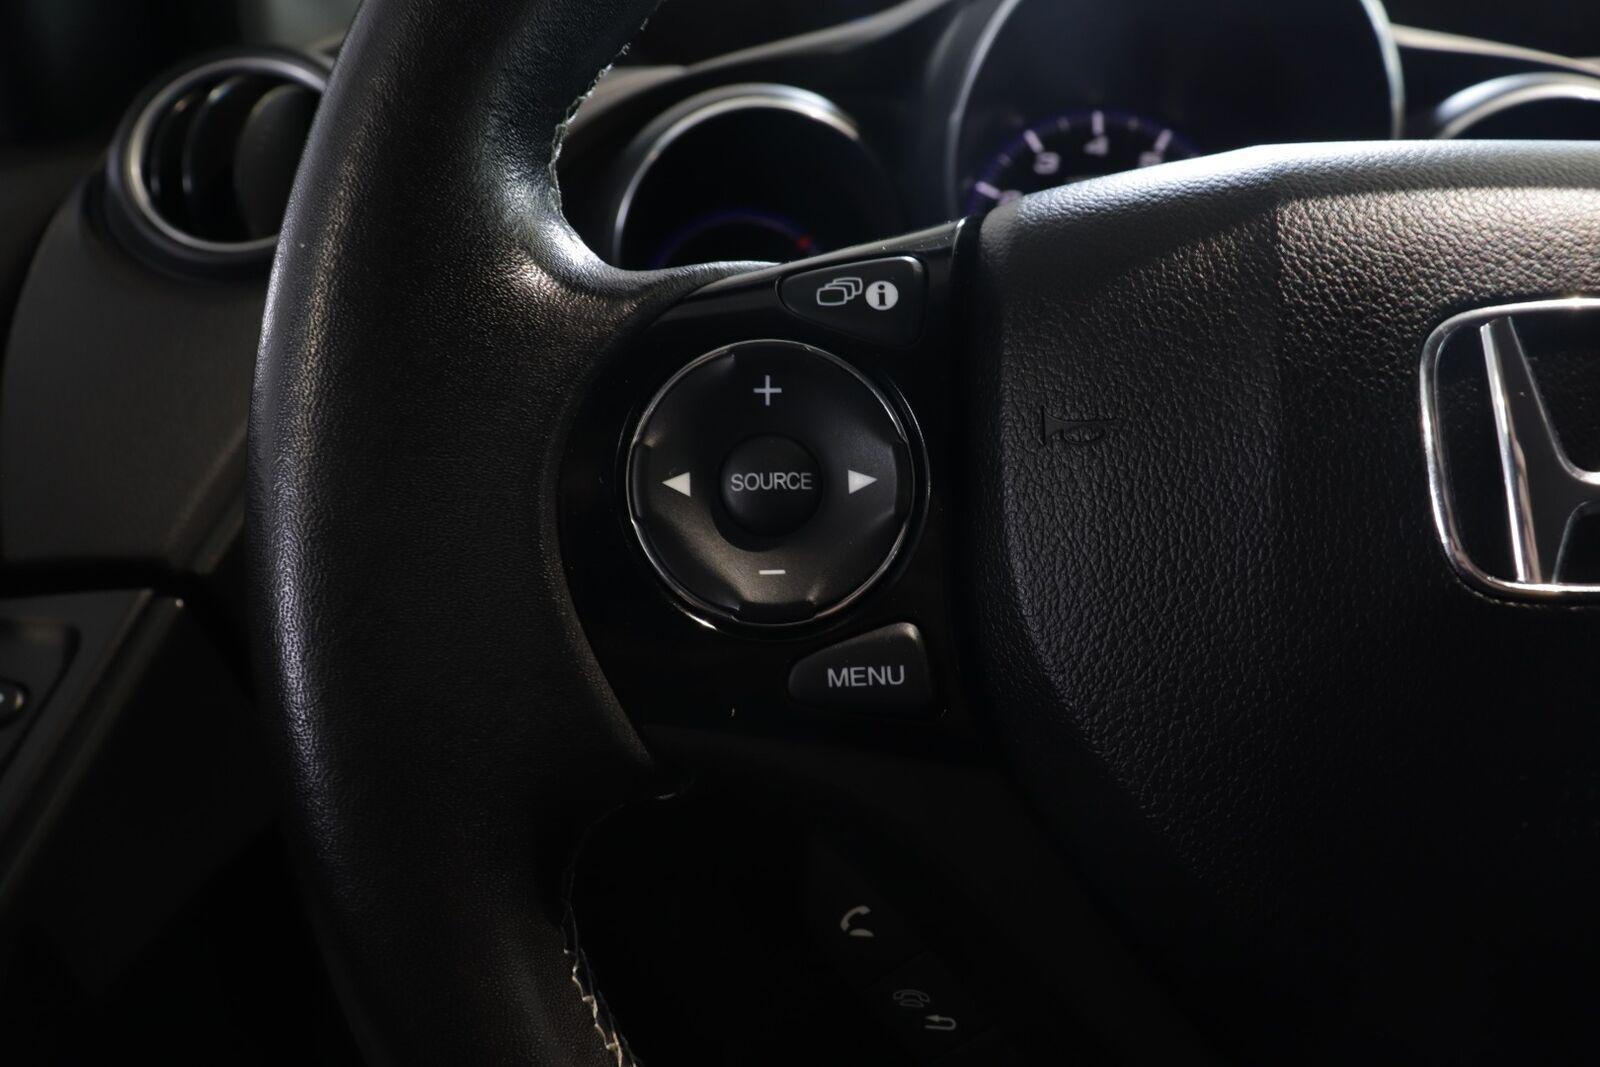 Honda Civic i-VTEC Comfort